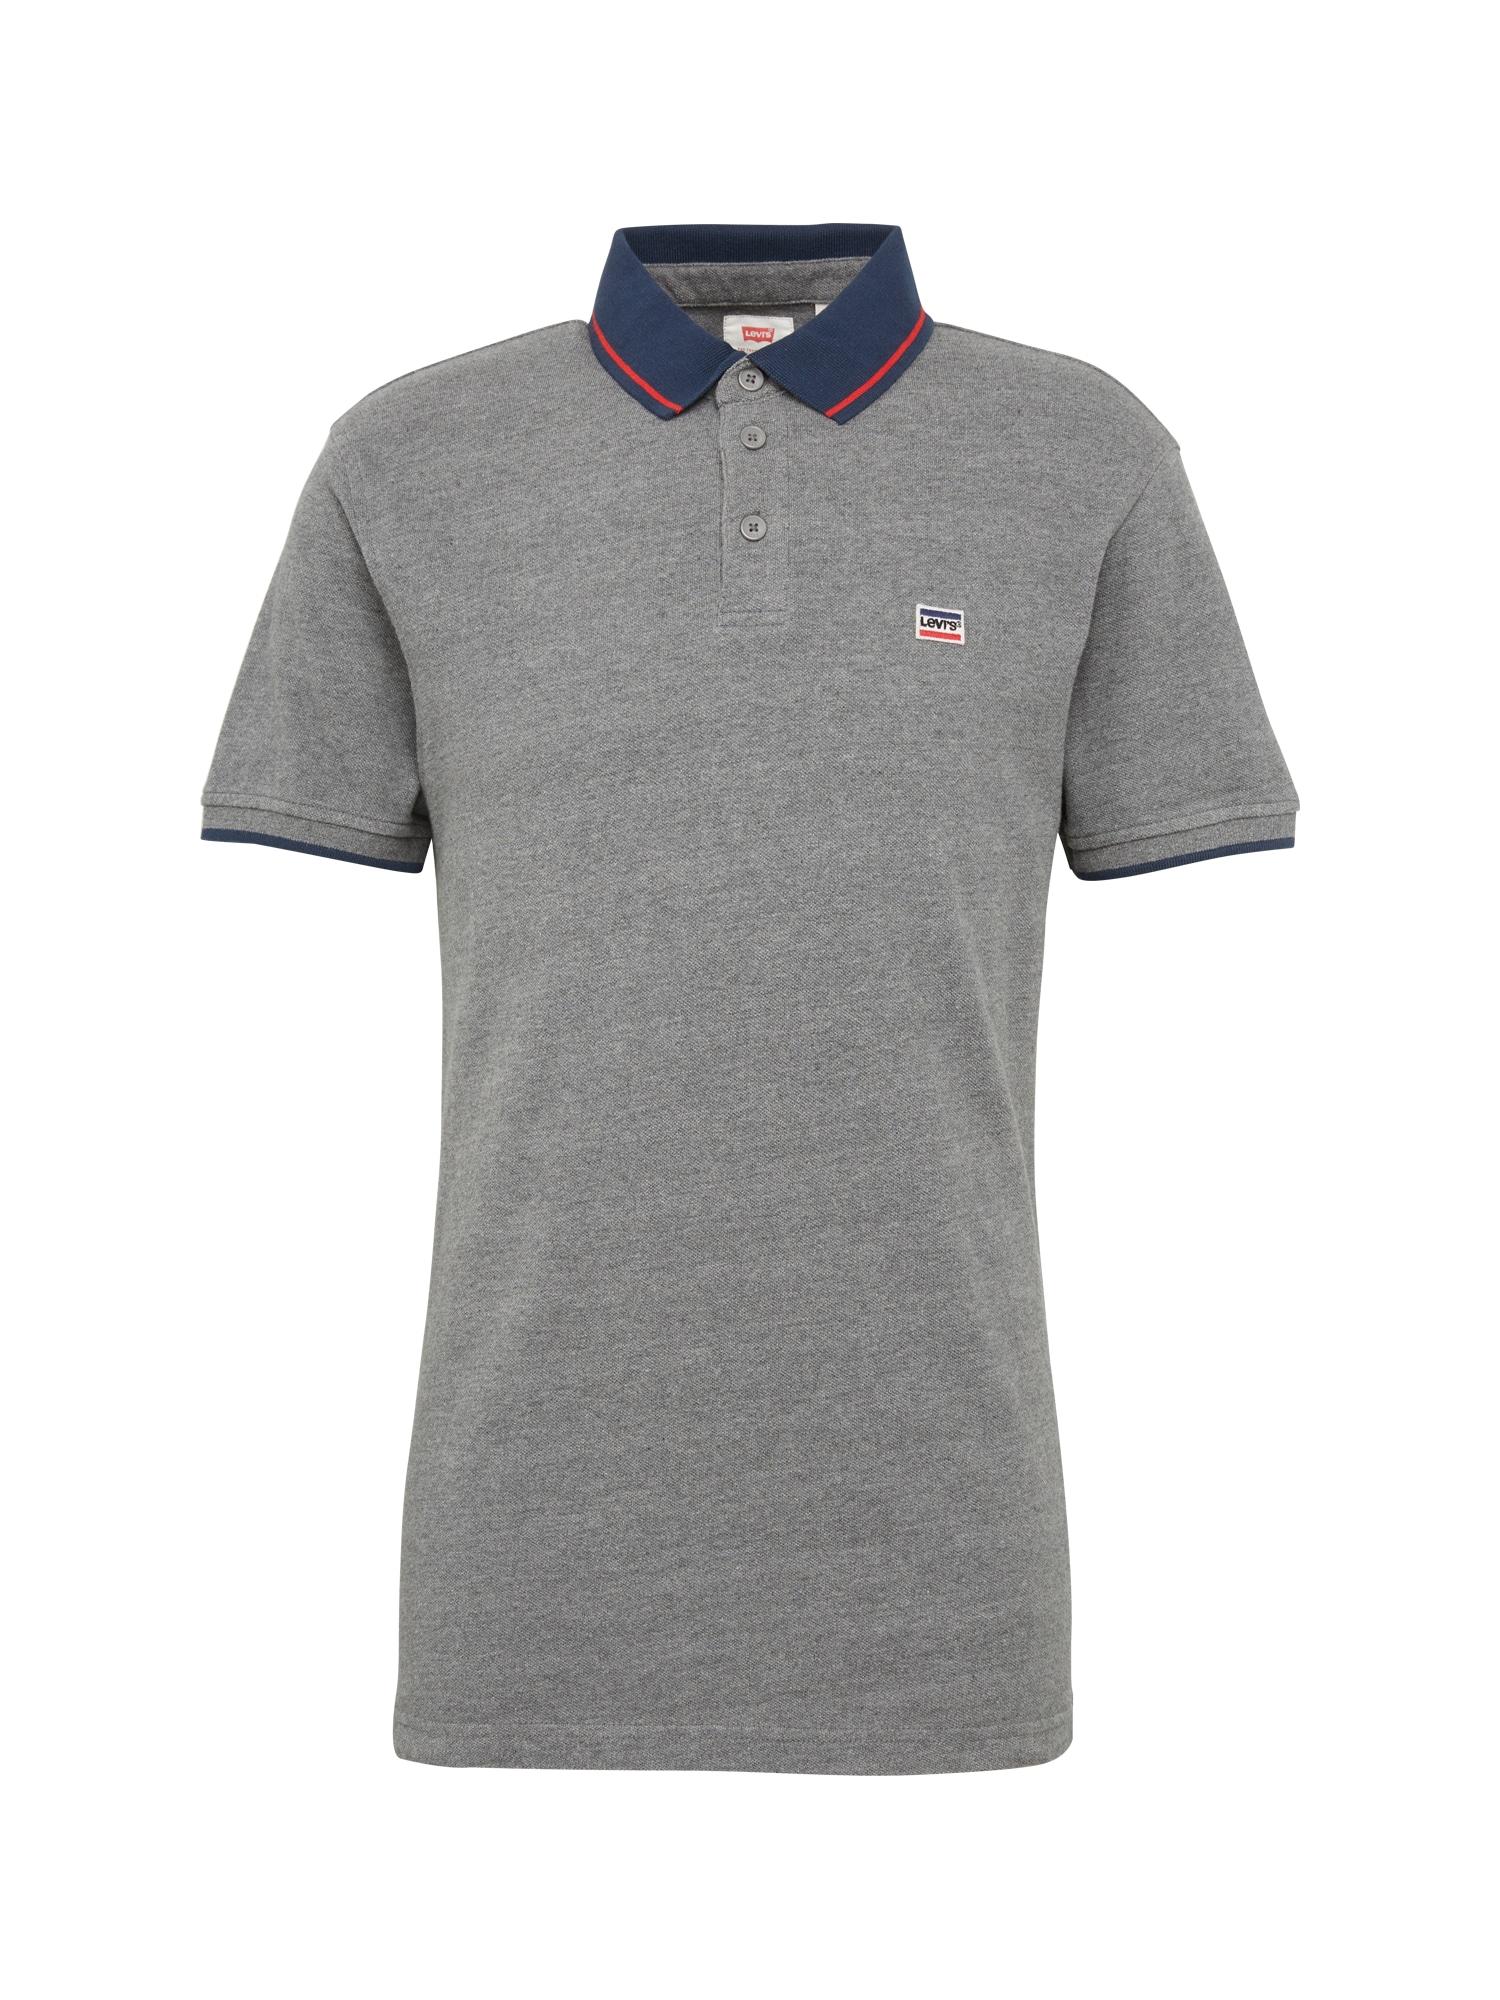 LEVI'S Heren Shirt BREAKER LOGO POLO grijs gemêleerd